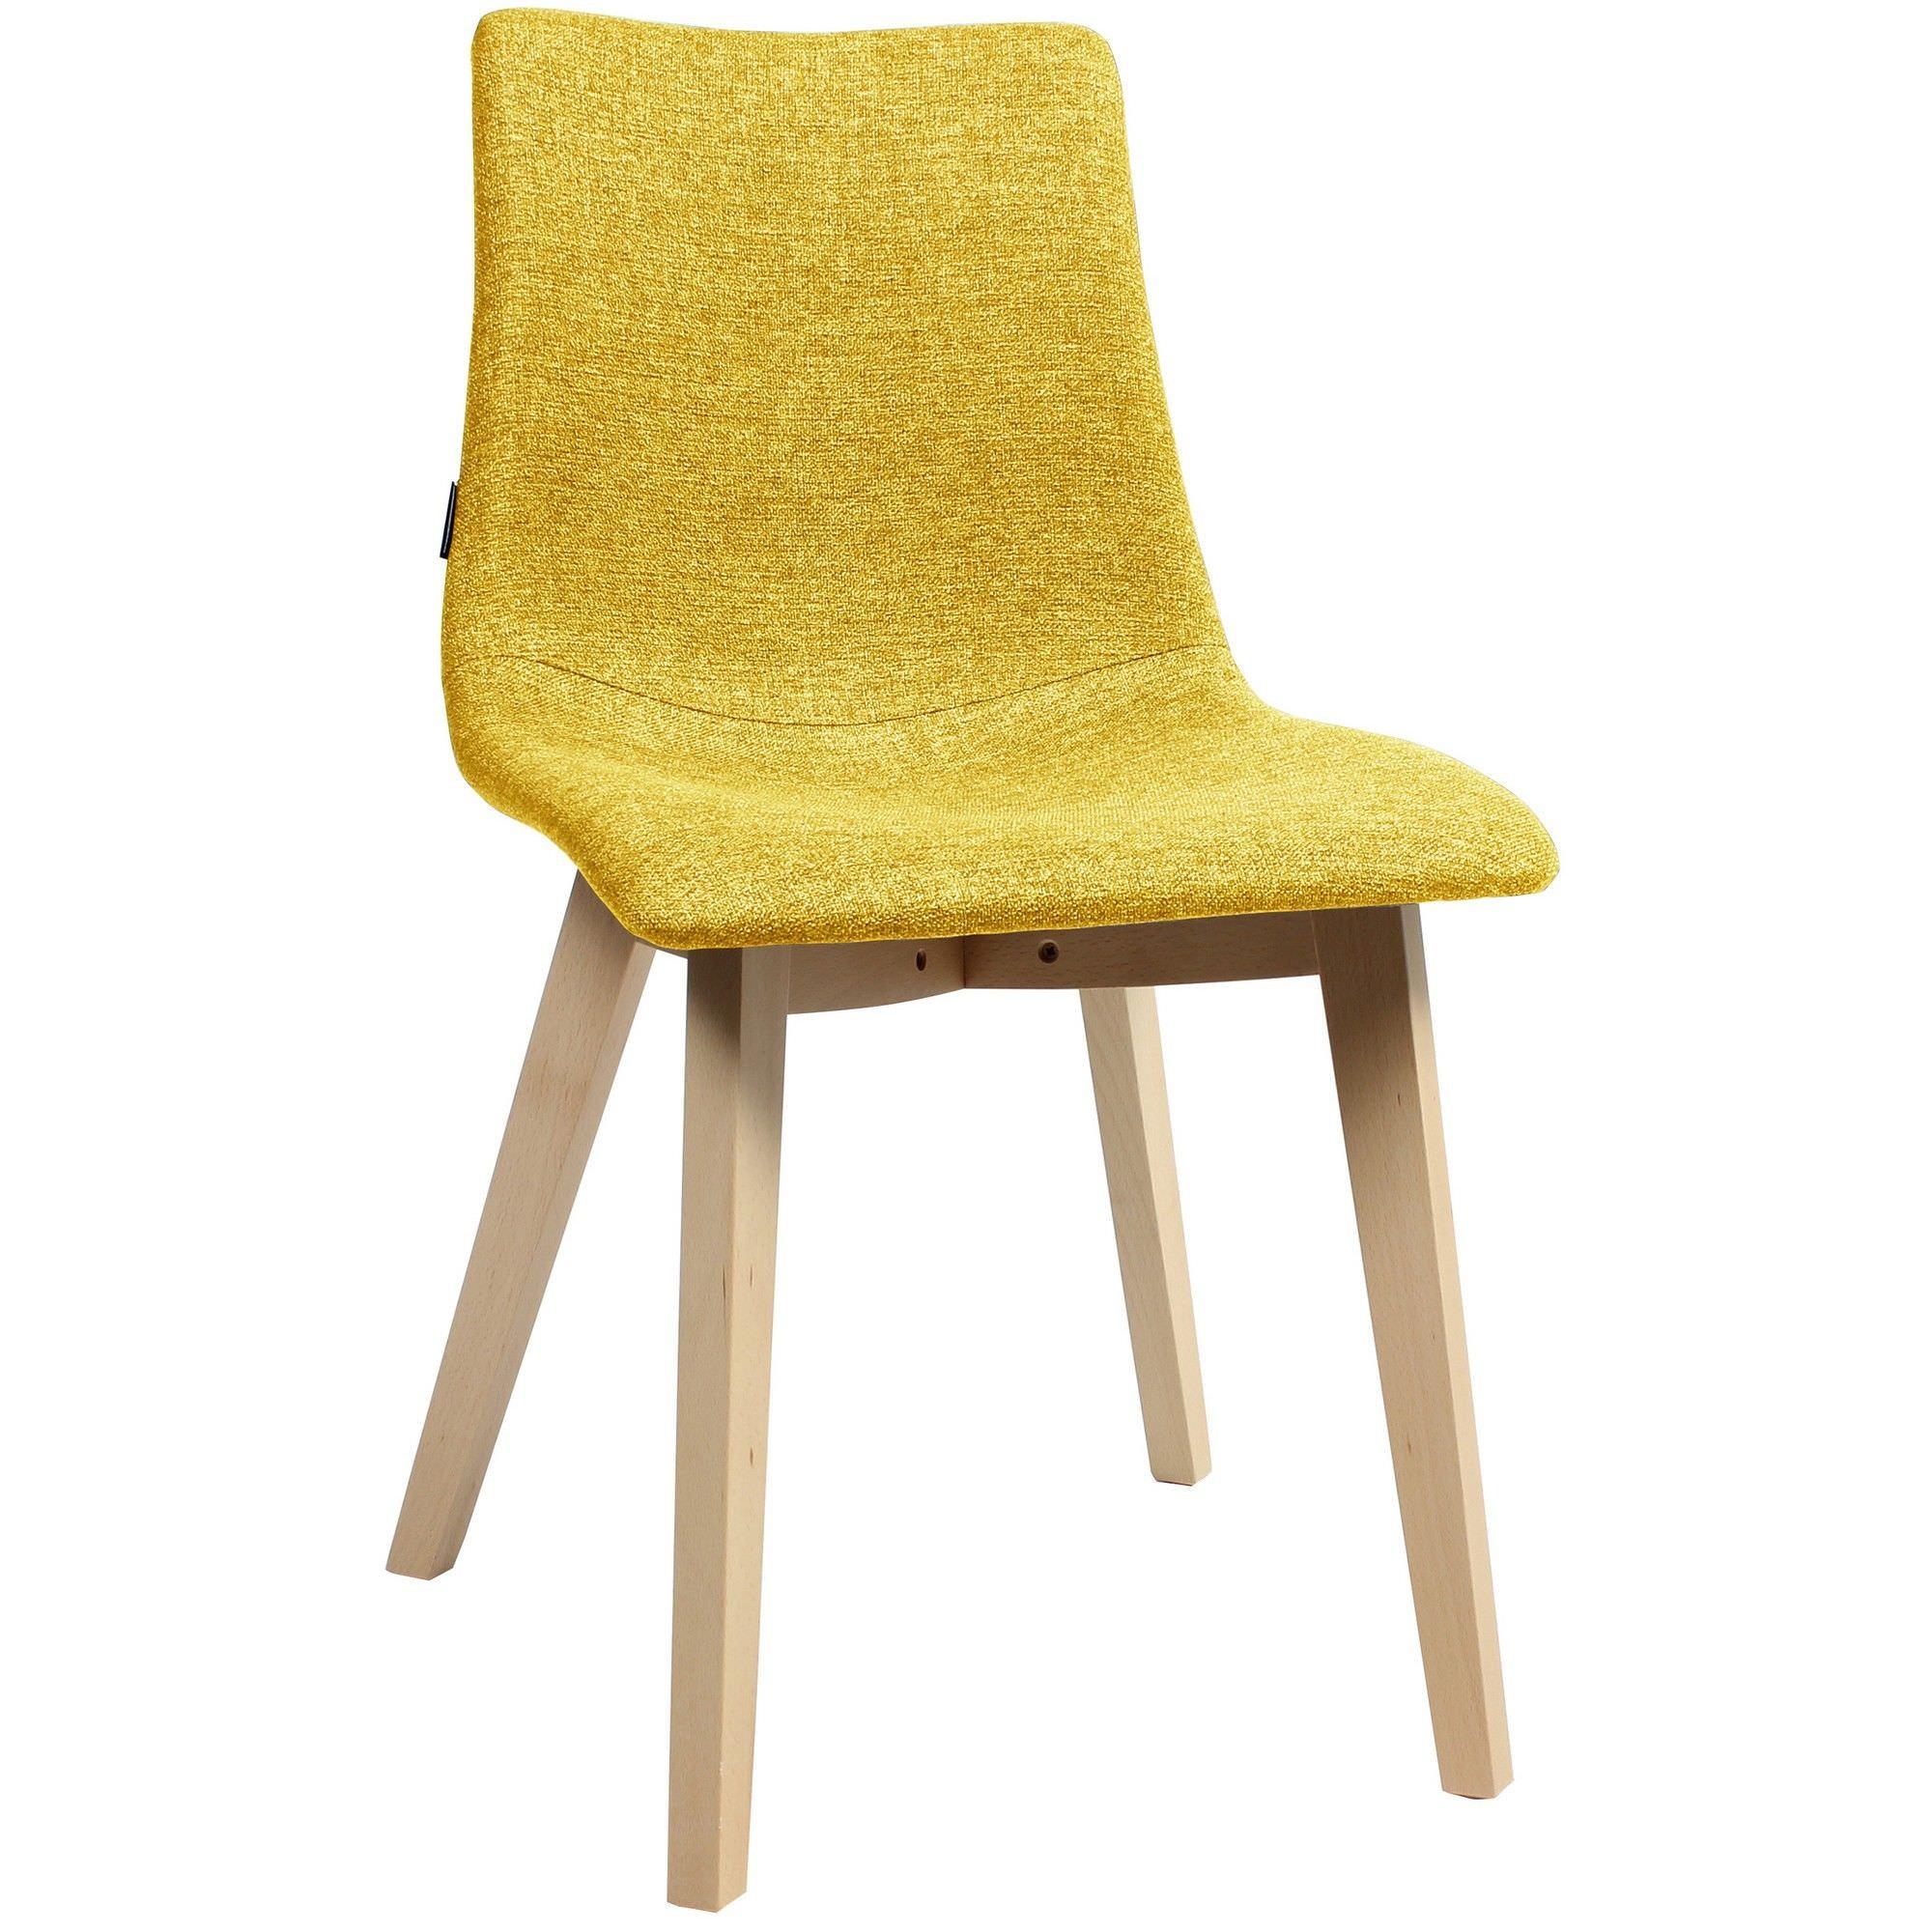 Zebra Pop Italian Made Commercial Grade Fabric Dining Chair, Timber Leg, Saffron / Natural